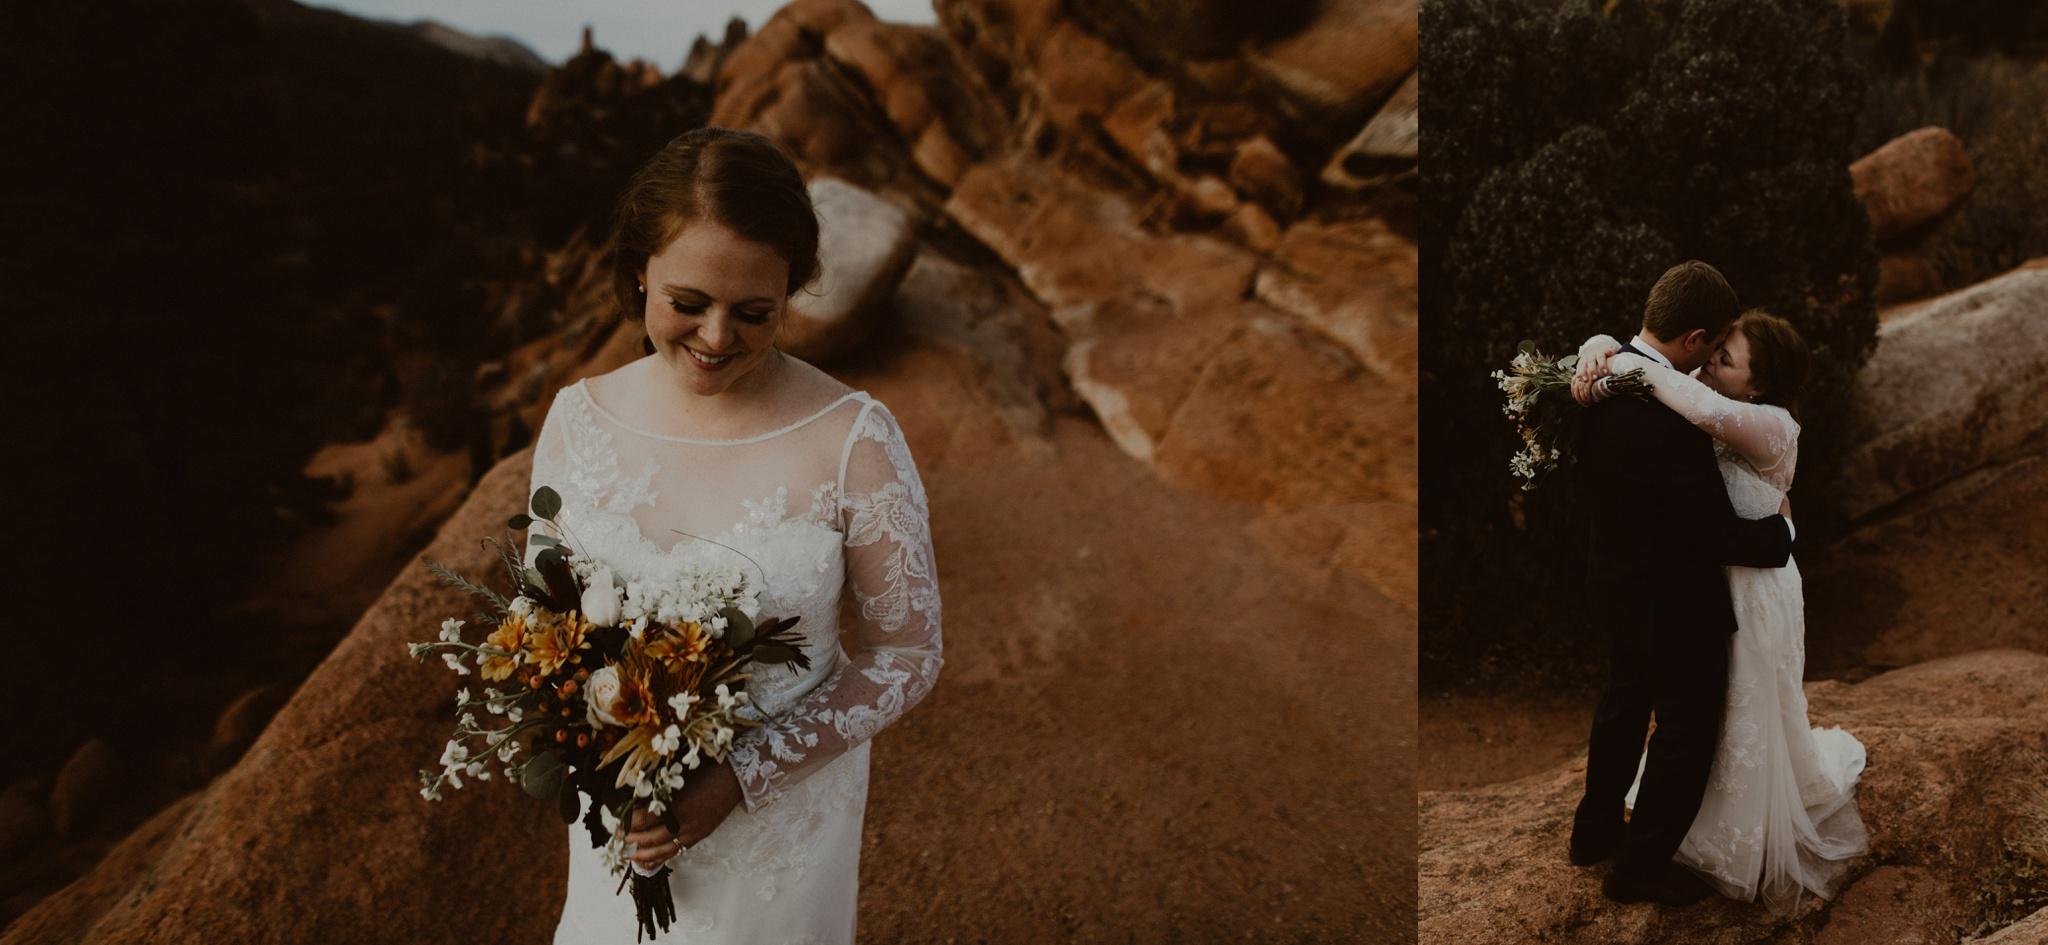 trinjensen photography, nebraska outdoor wedding photographer_2837.jpg